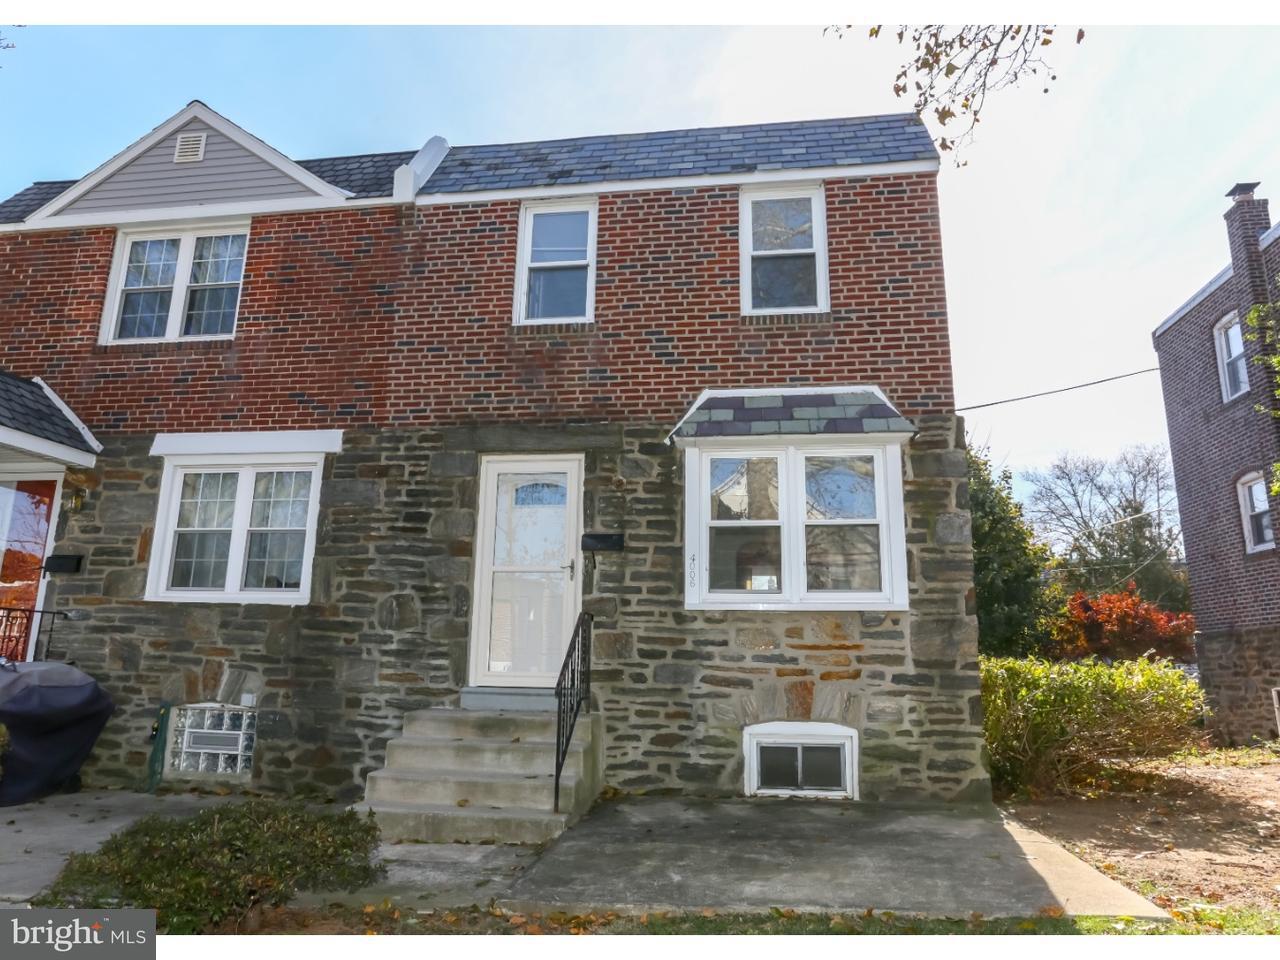 4006  Marshall Drexel Hill, PA 19026